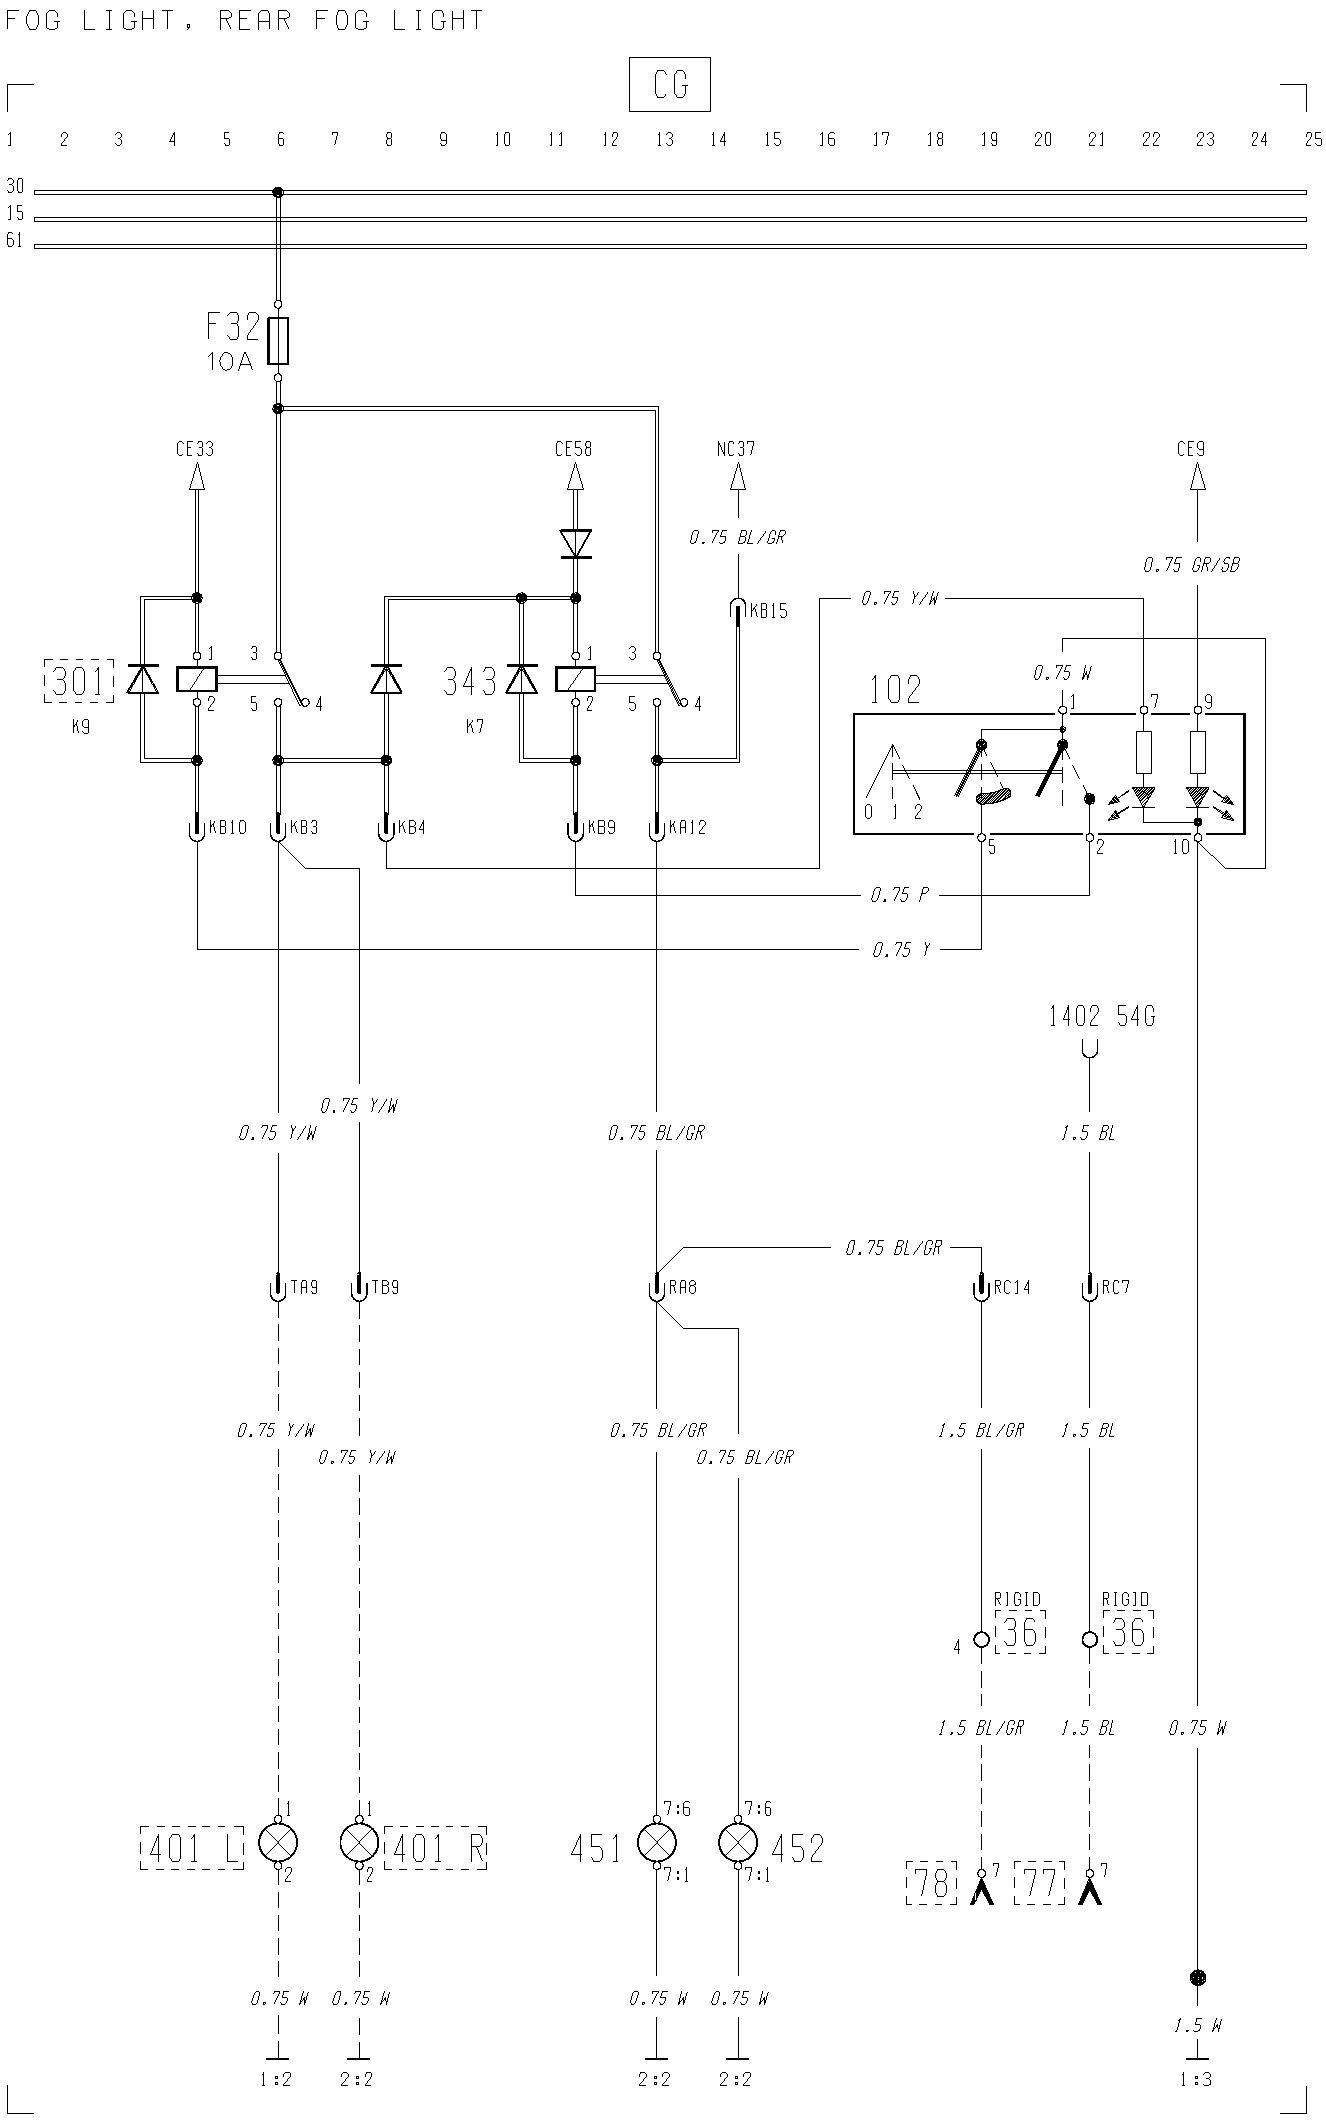 Excellent Volvo F12 F16 Wiring Diagram Fog Light Rear Fog Light Wiring 101 Swasaxxcnl